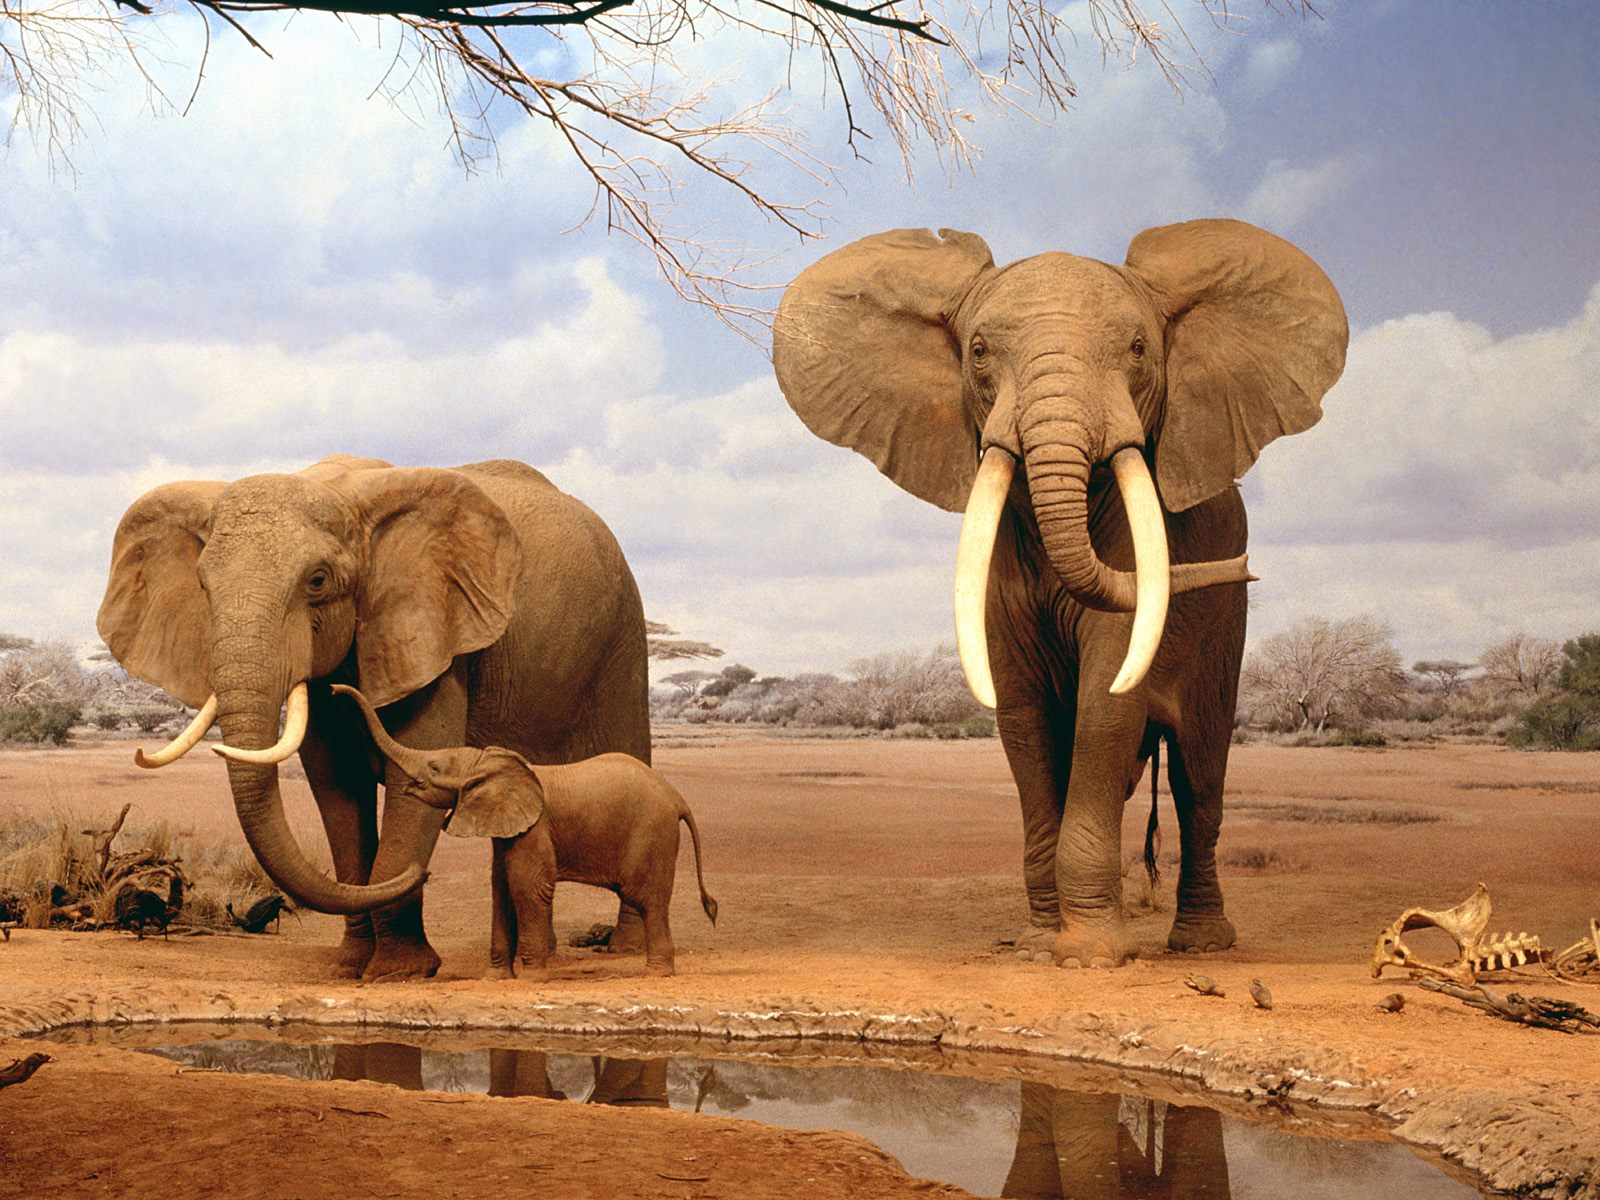 baby elephant wallpaper desktopjpg 1600x1200